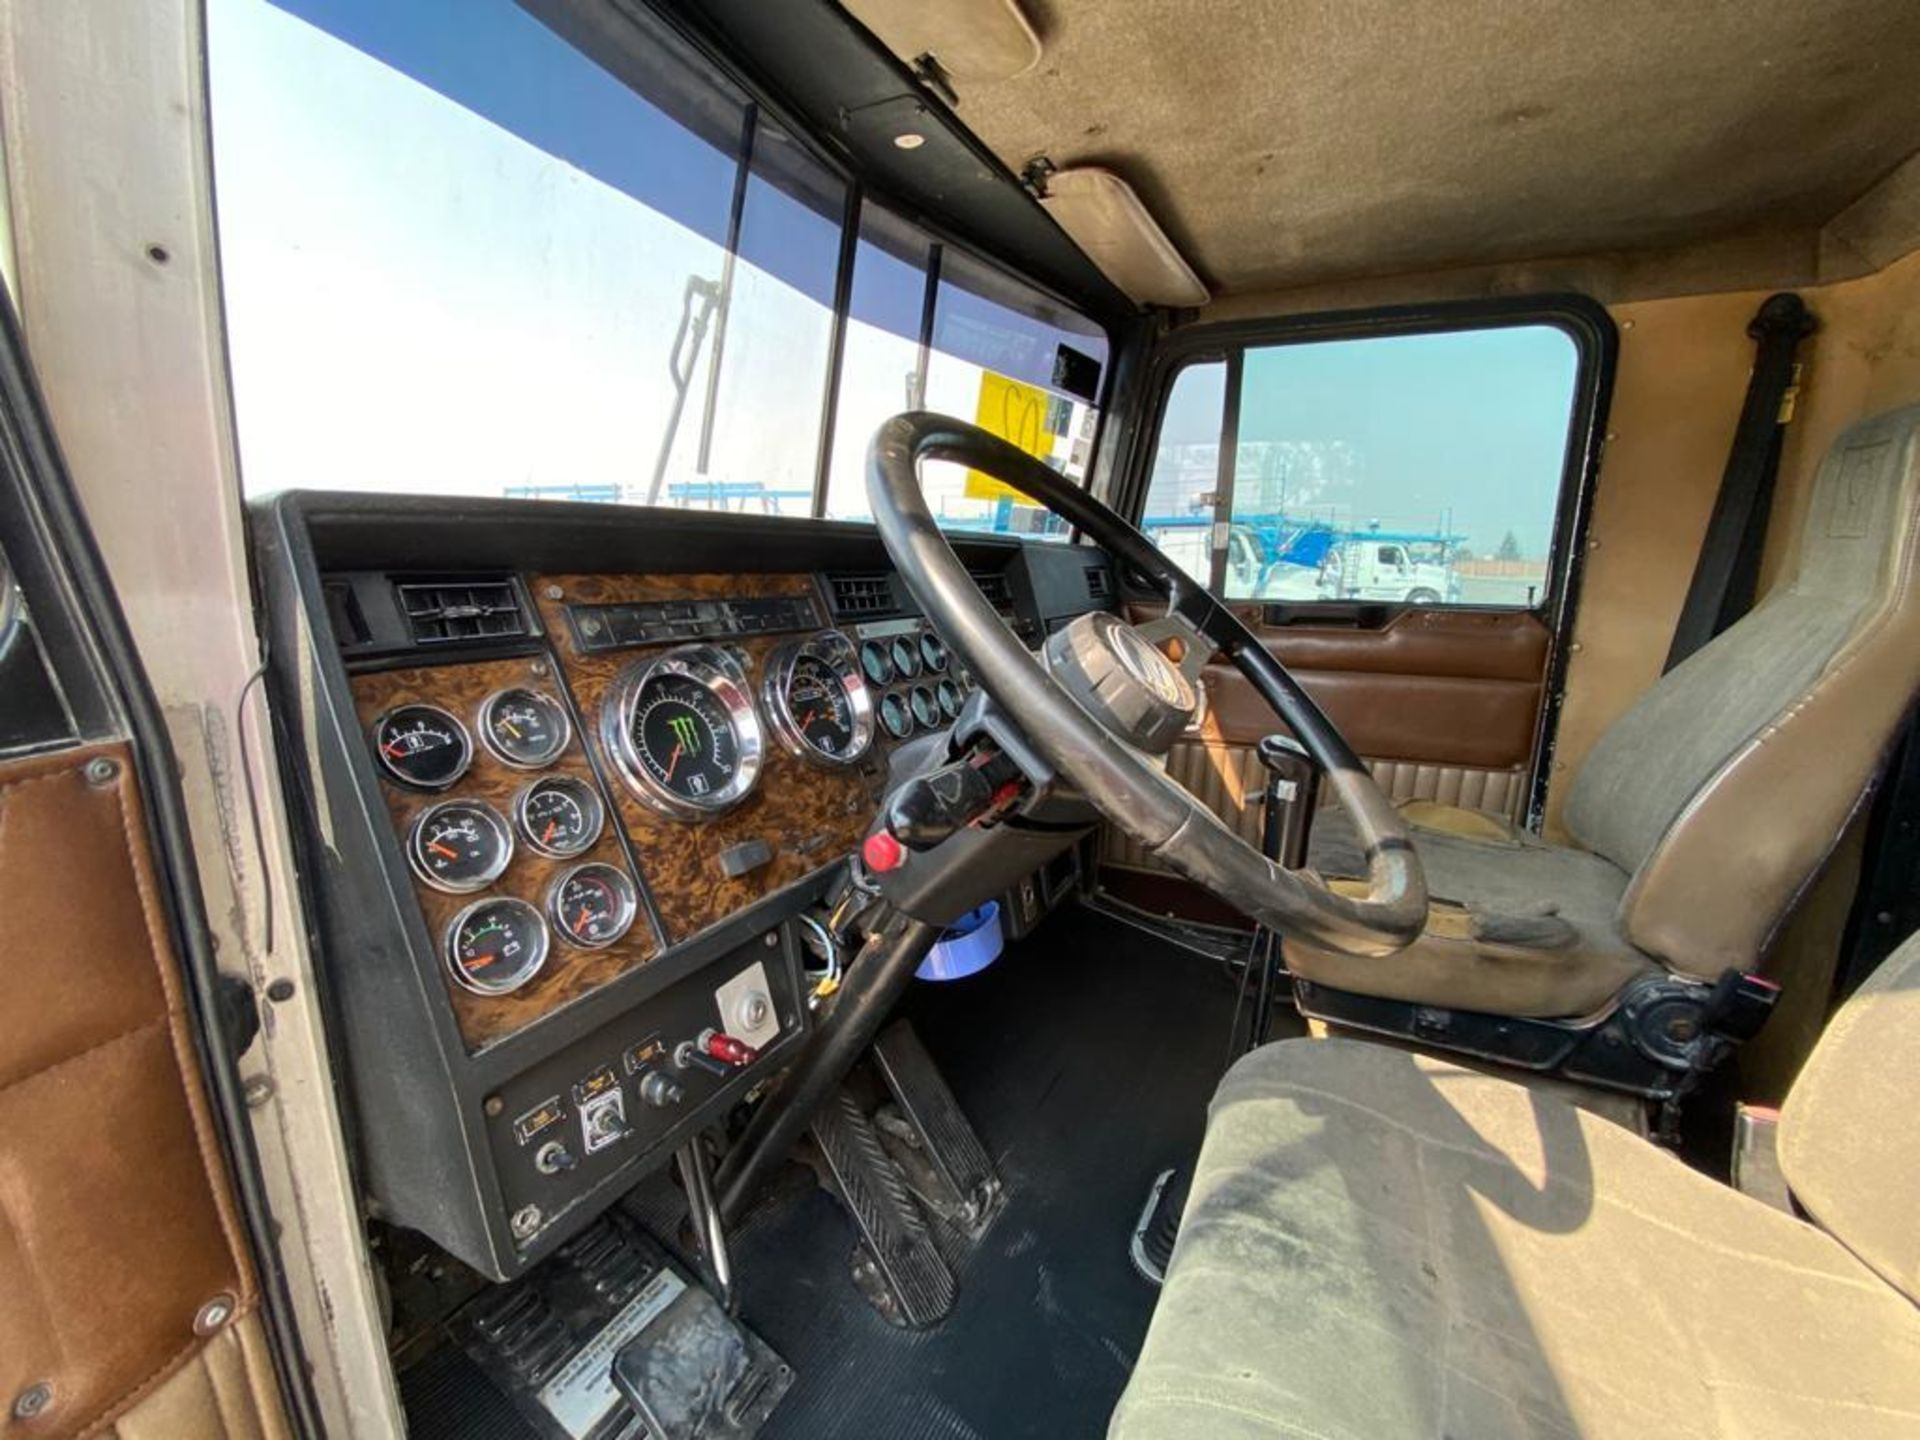 1999 Kenworth Sleeper truck tractor, standard transmission of 18 speeds - Image 49 of 75